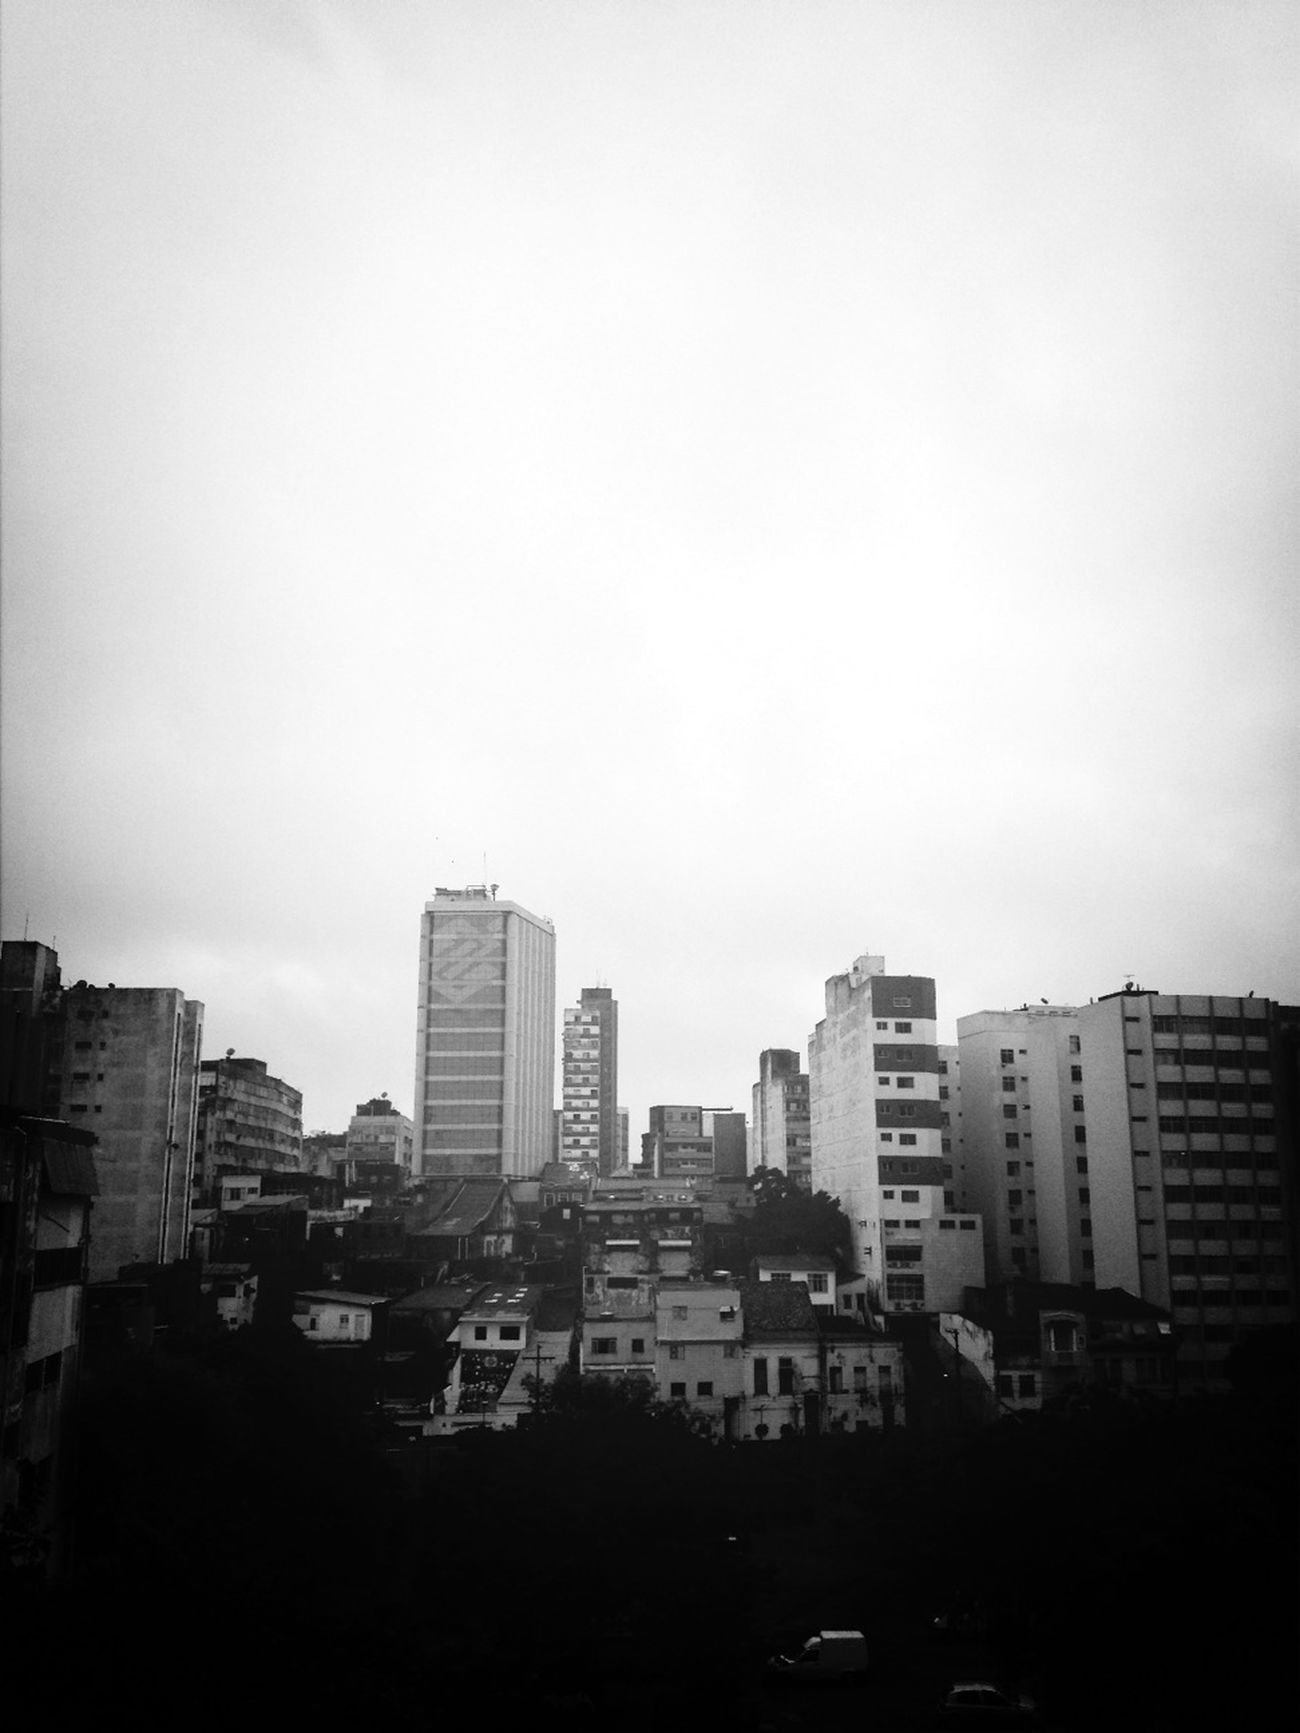 18.06.2013